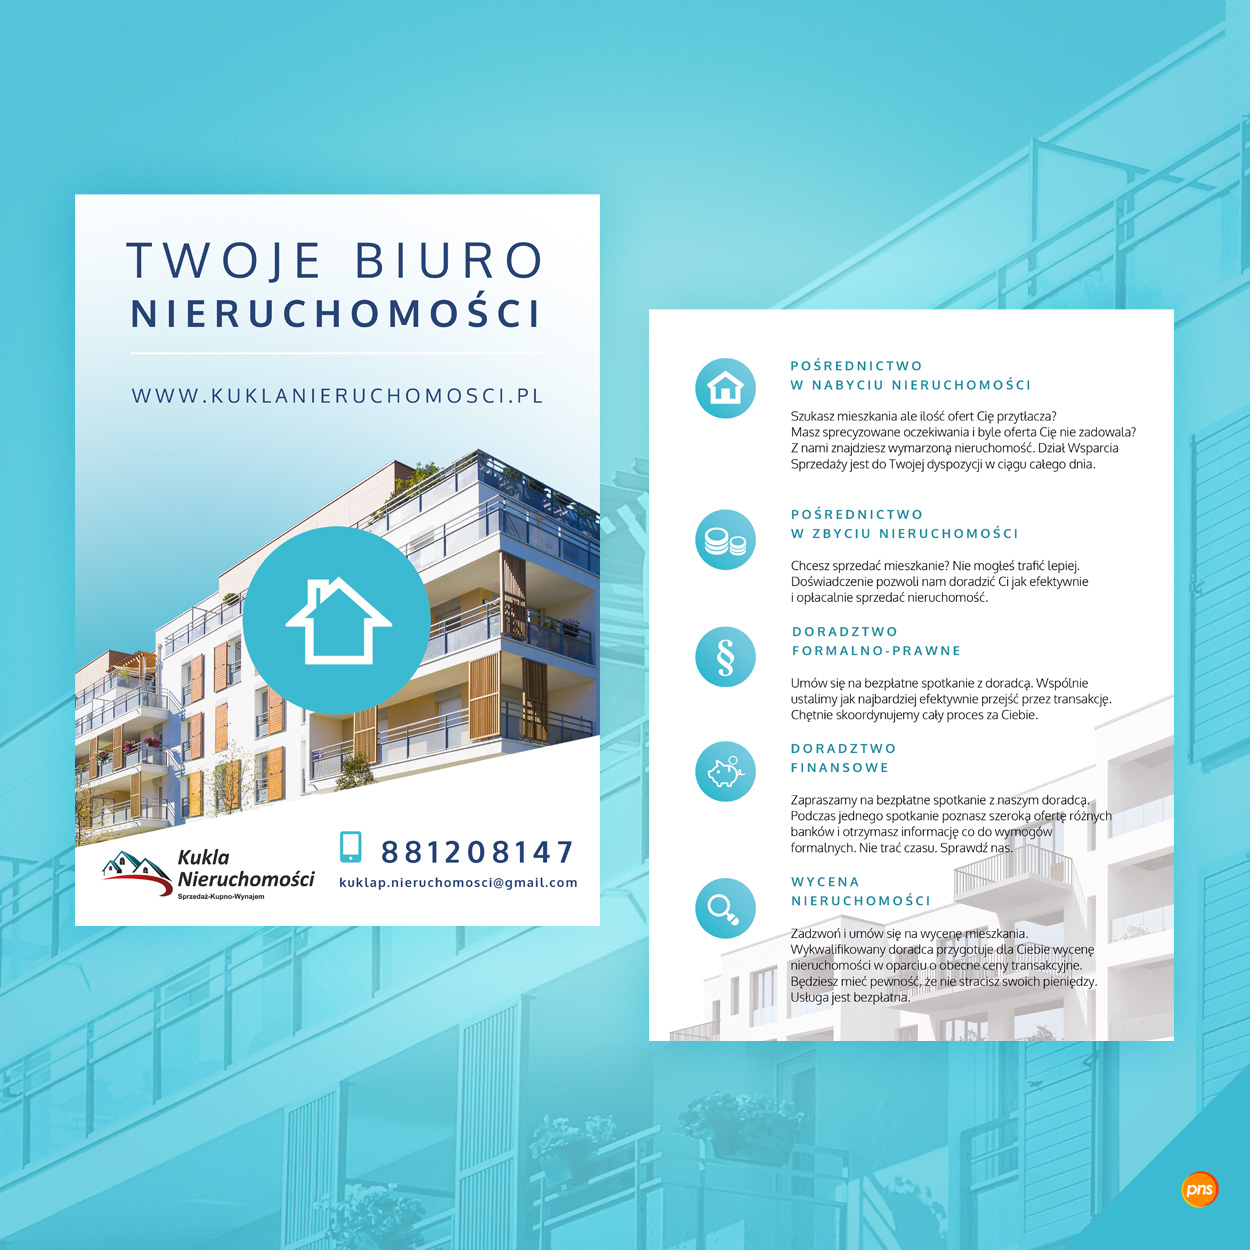 projekt ulotki dla biura nieruchomosci kukla 1 - Projekt ulotki dla biura nieruchomości - Kukla Nieruchomości